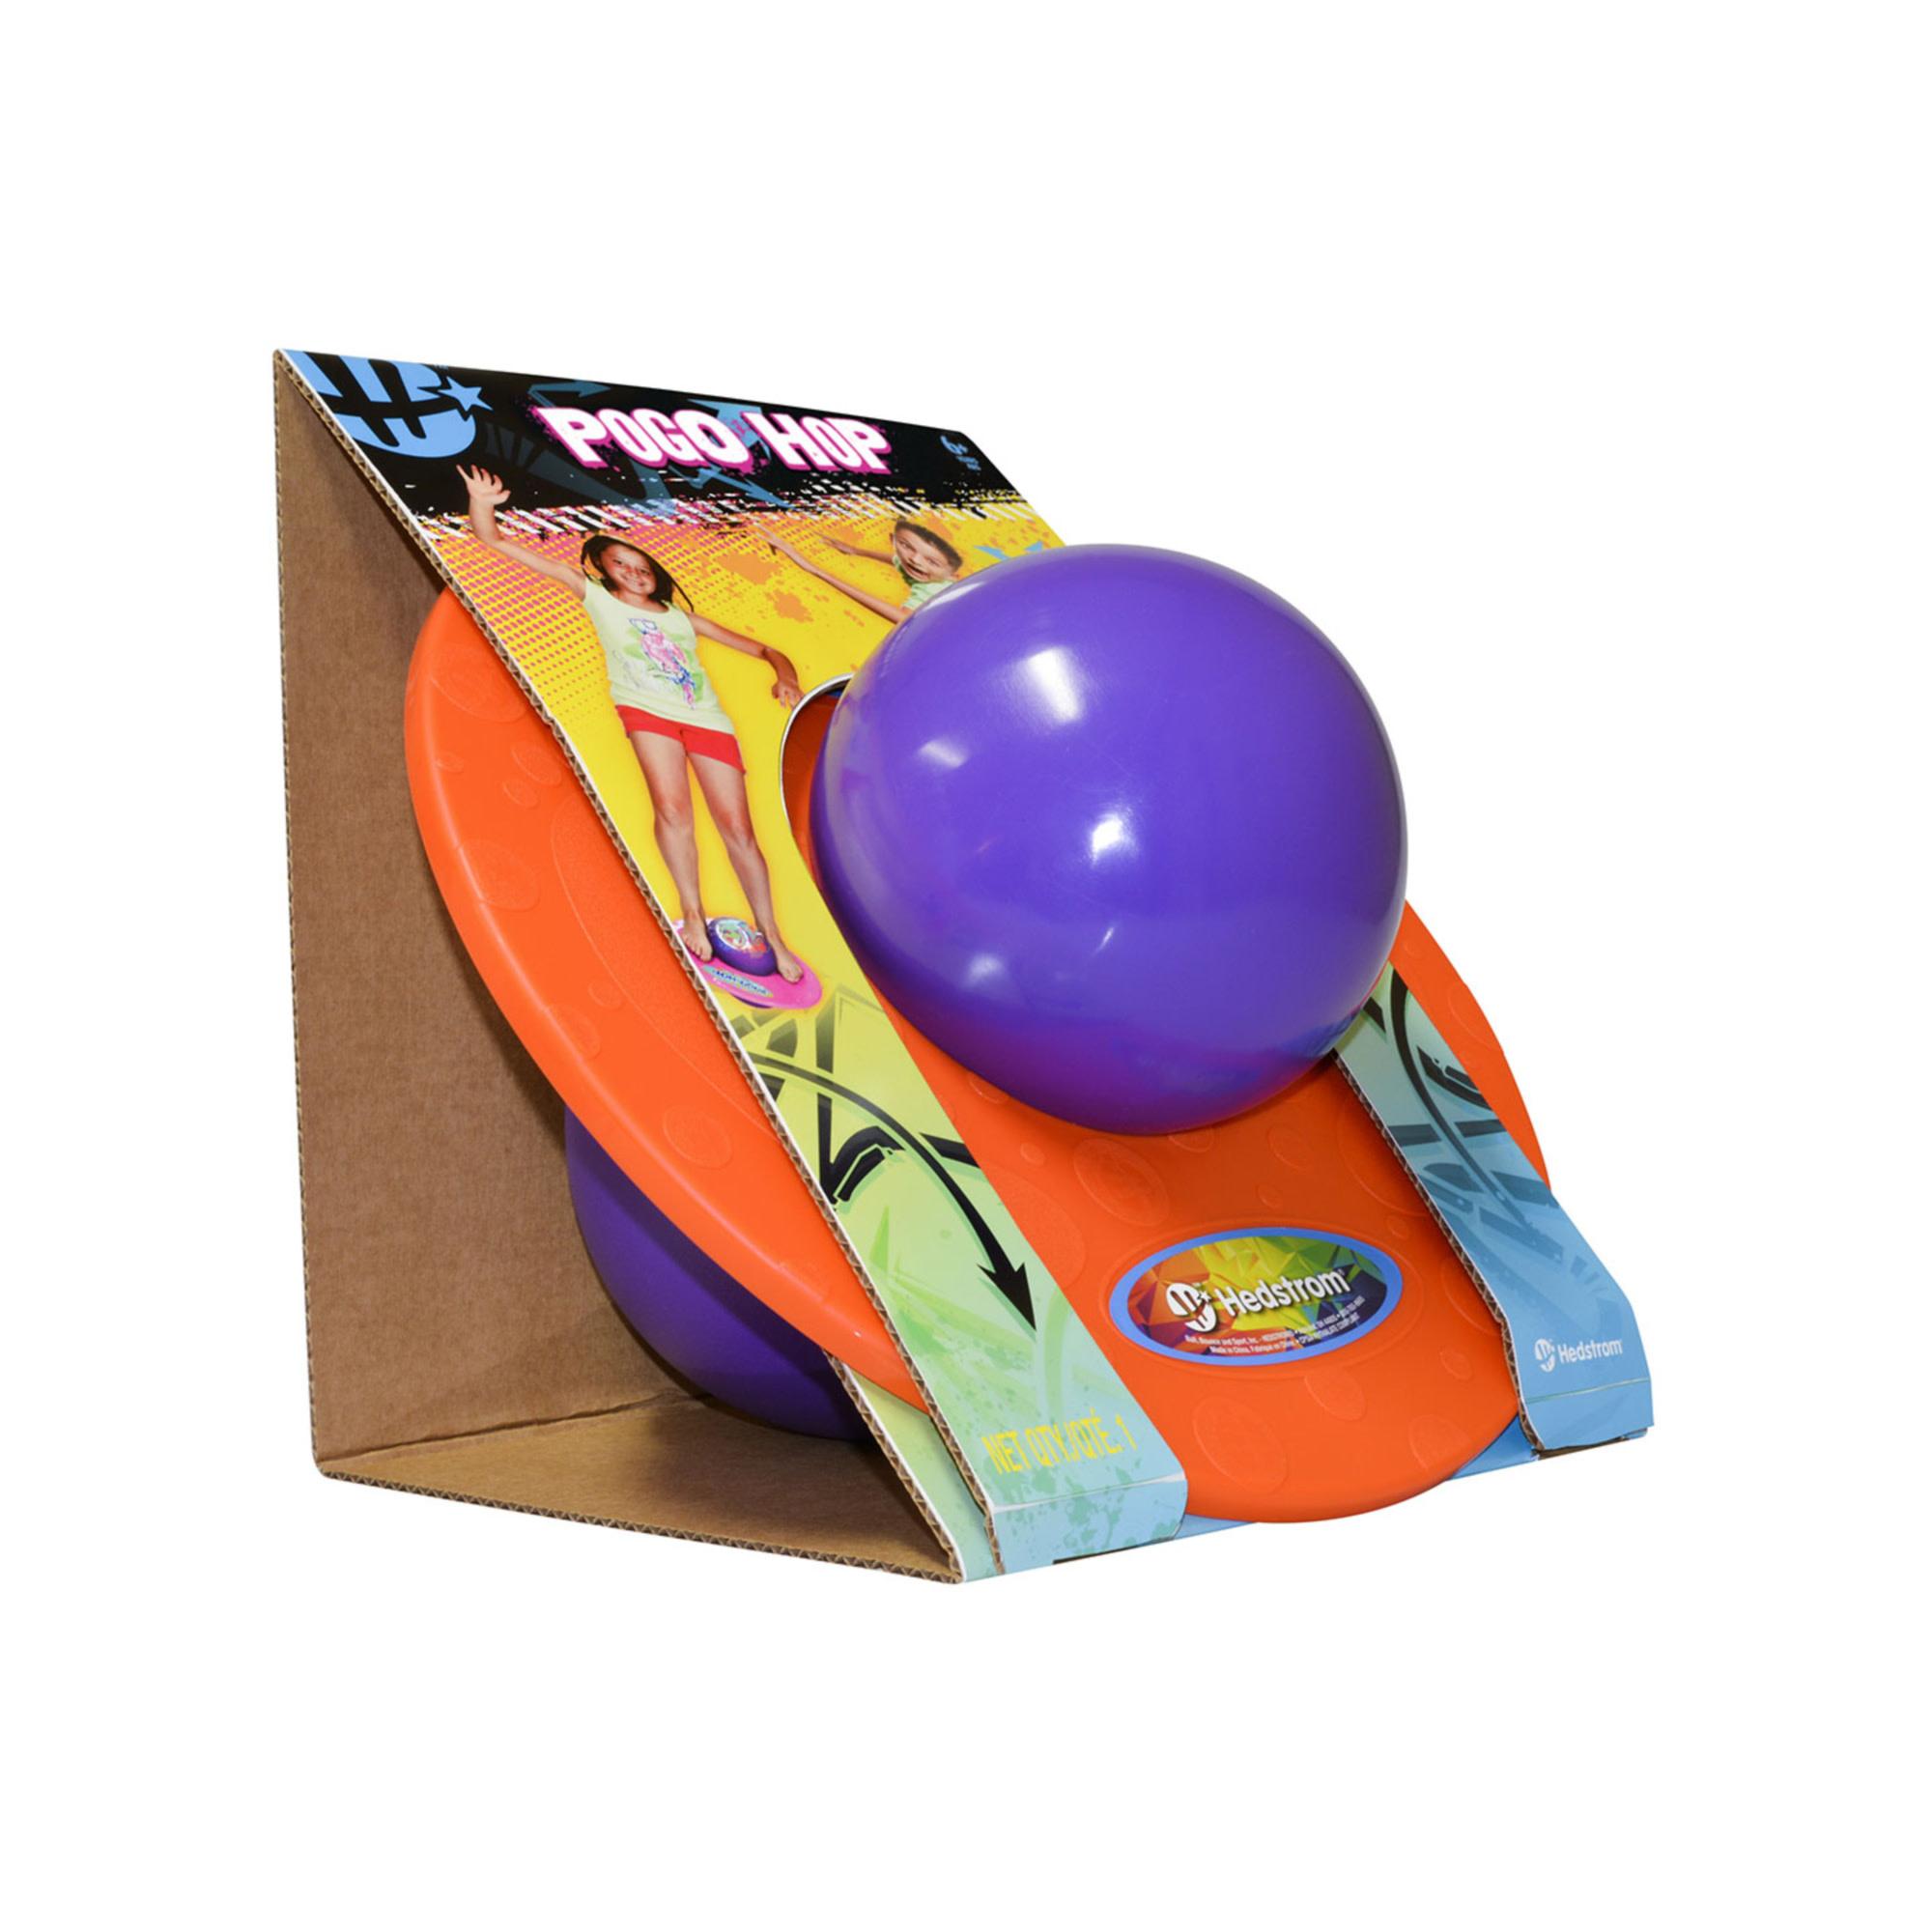 Sensory / Ball, Bounce & Sport Cnd Inc Pogo Ball 2 couleurs